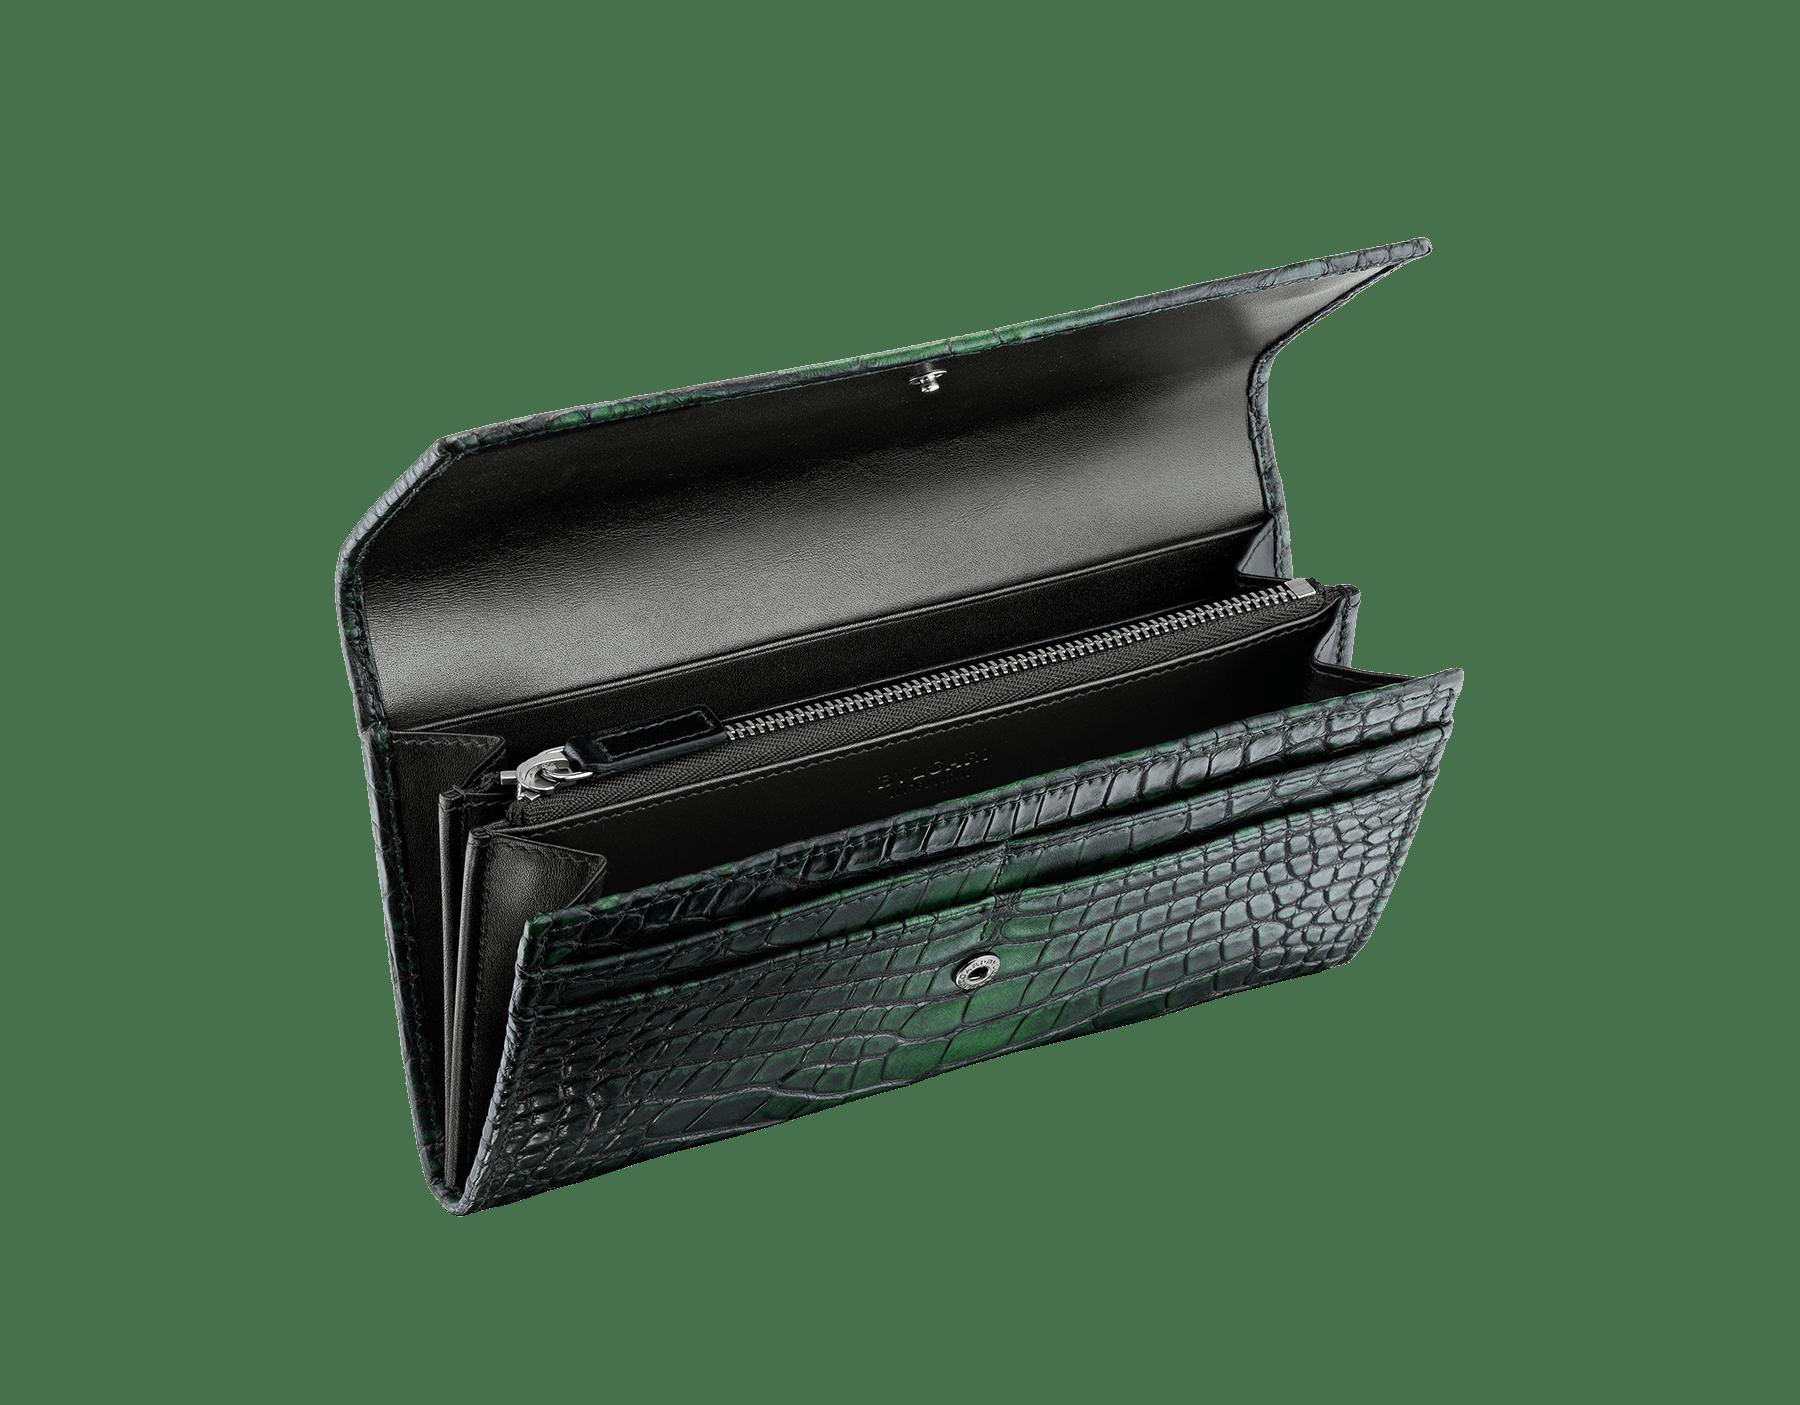 Man wallet pochette in Jungle green alligator skin and black smooth calf leather, with brass dark ruthenium plated hardware featuring the Bulgari-Bulgari motif. BBM-WLT-POC-10C-HE image 2